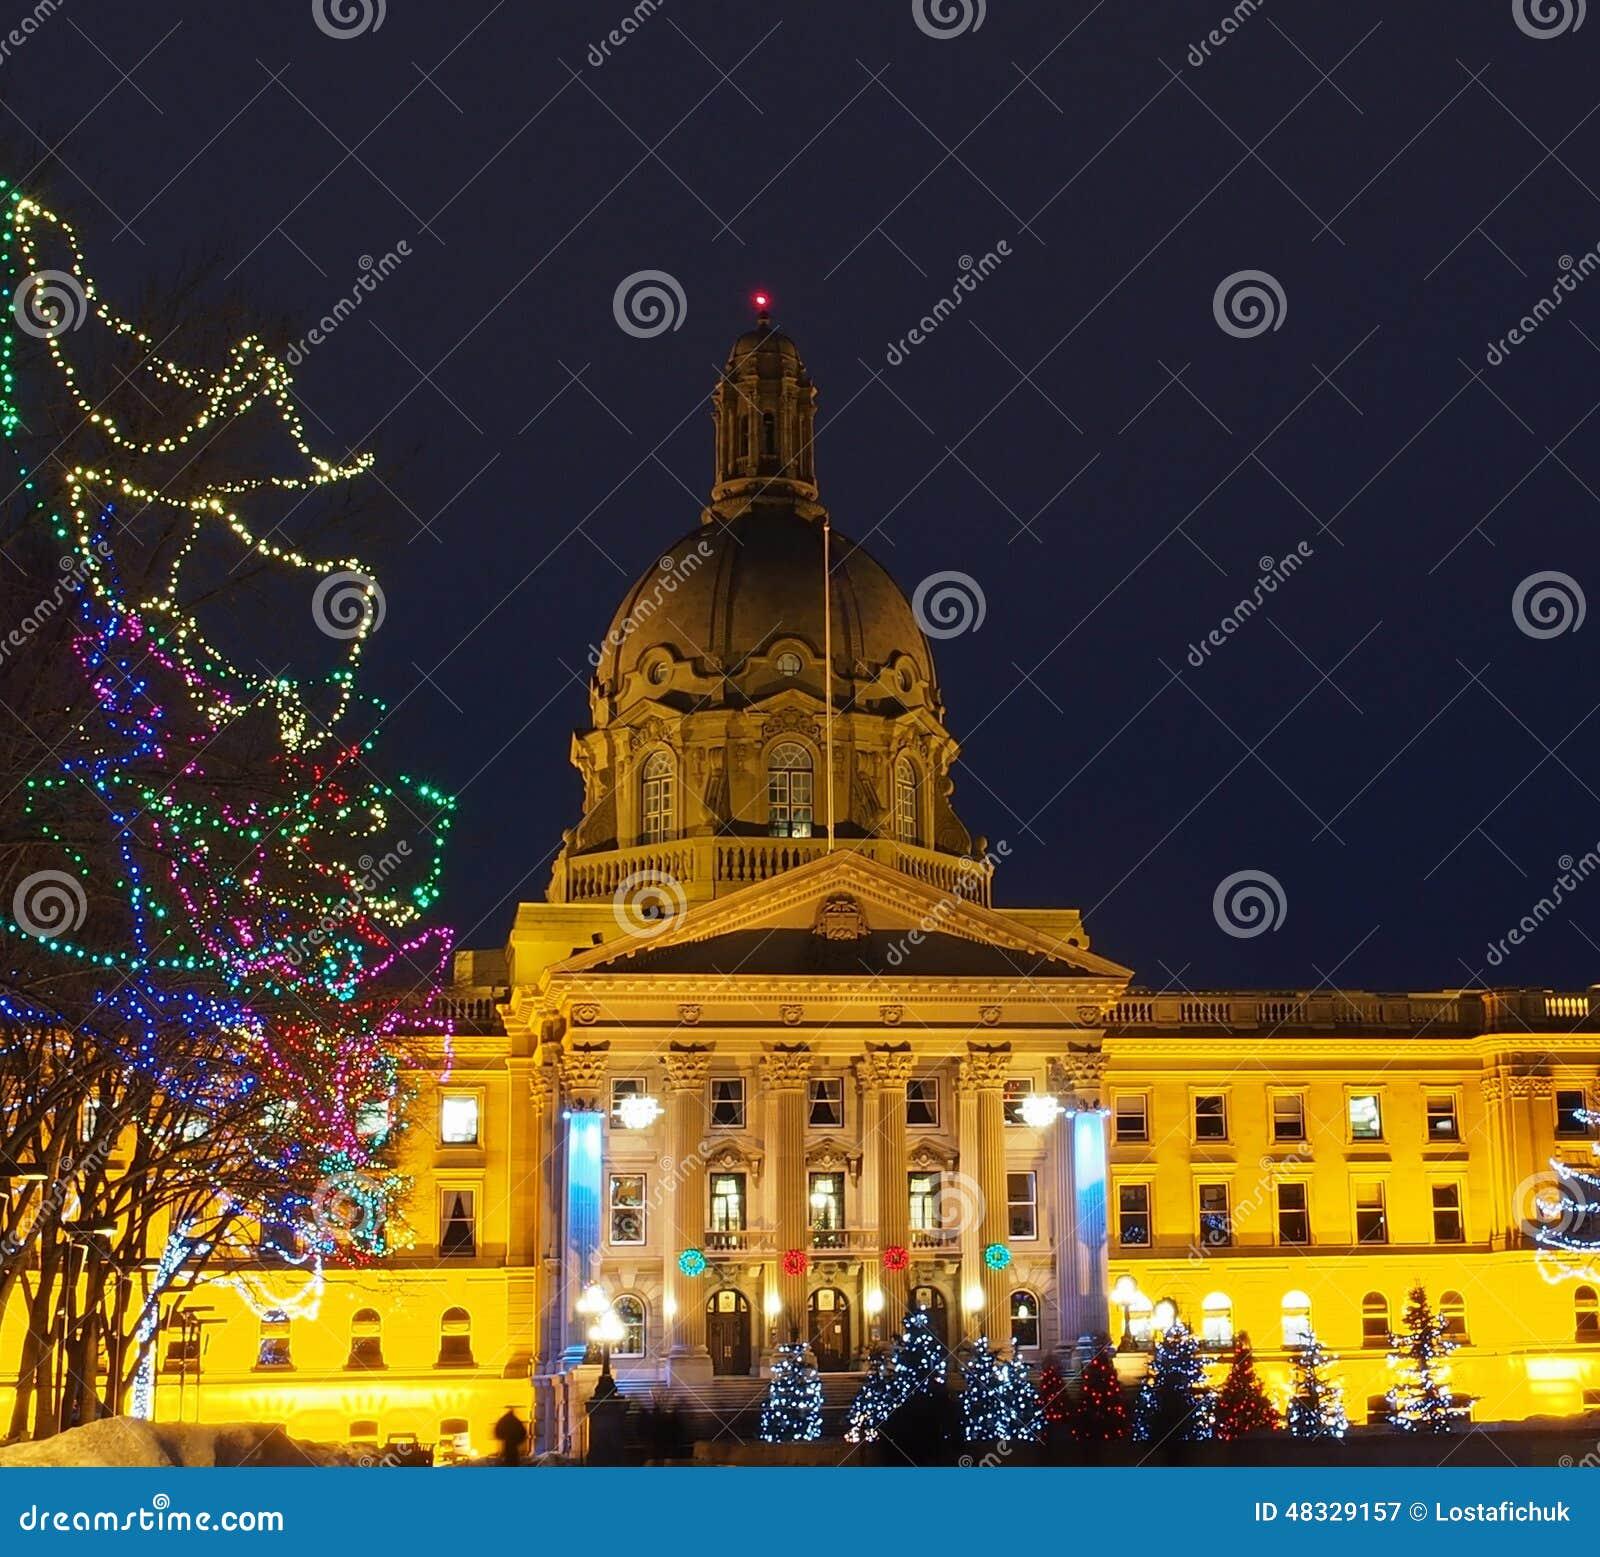 Edmonton de construction législatif, Alberta With Christmas Lights